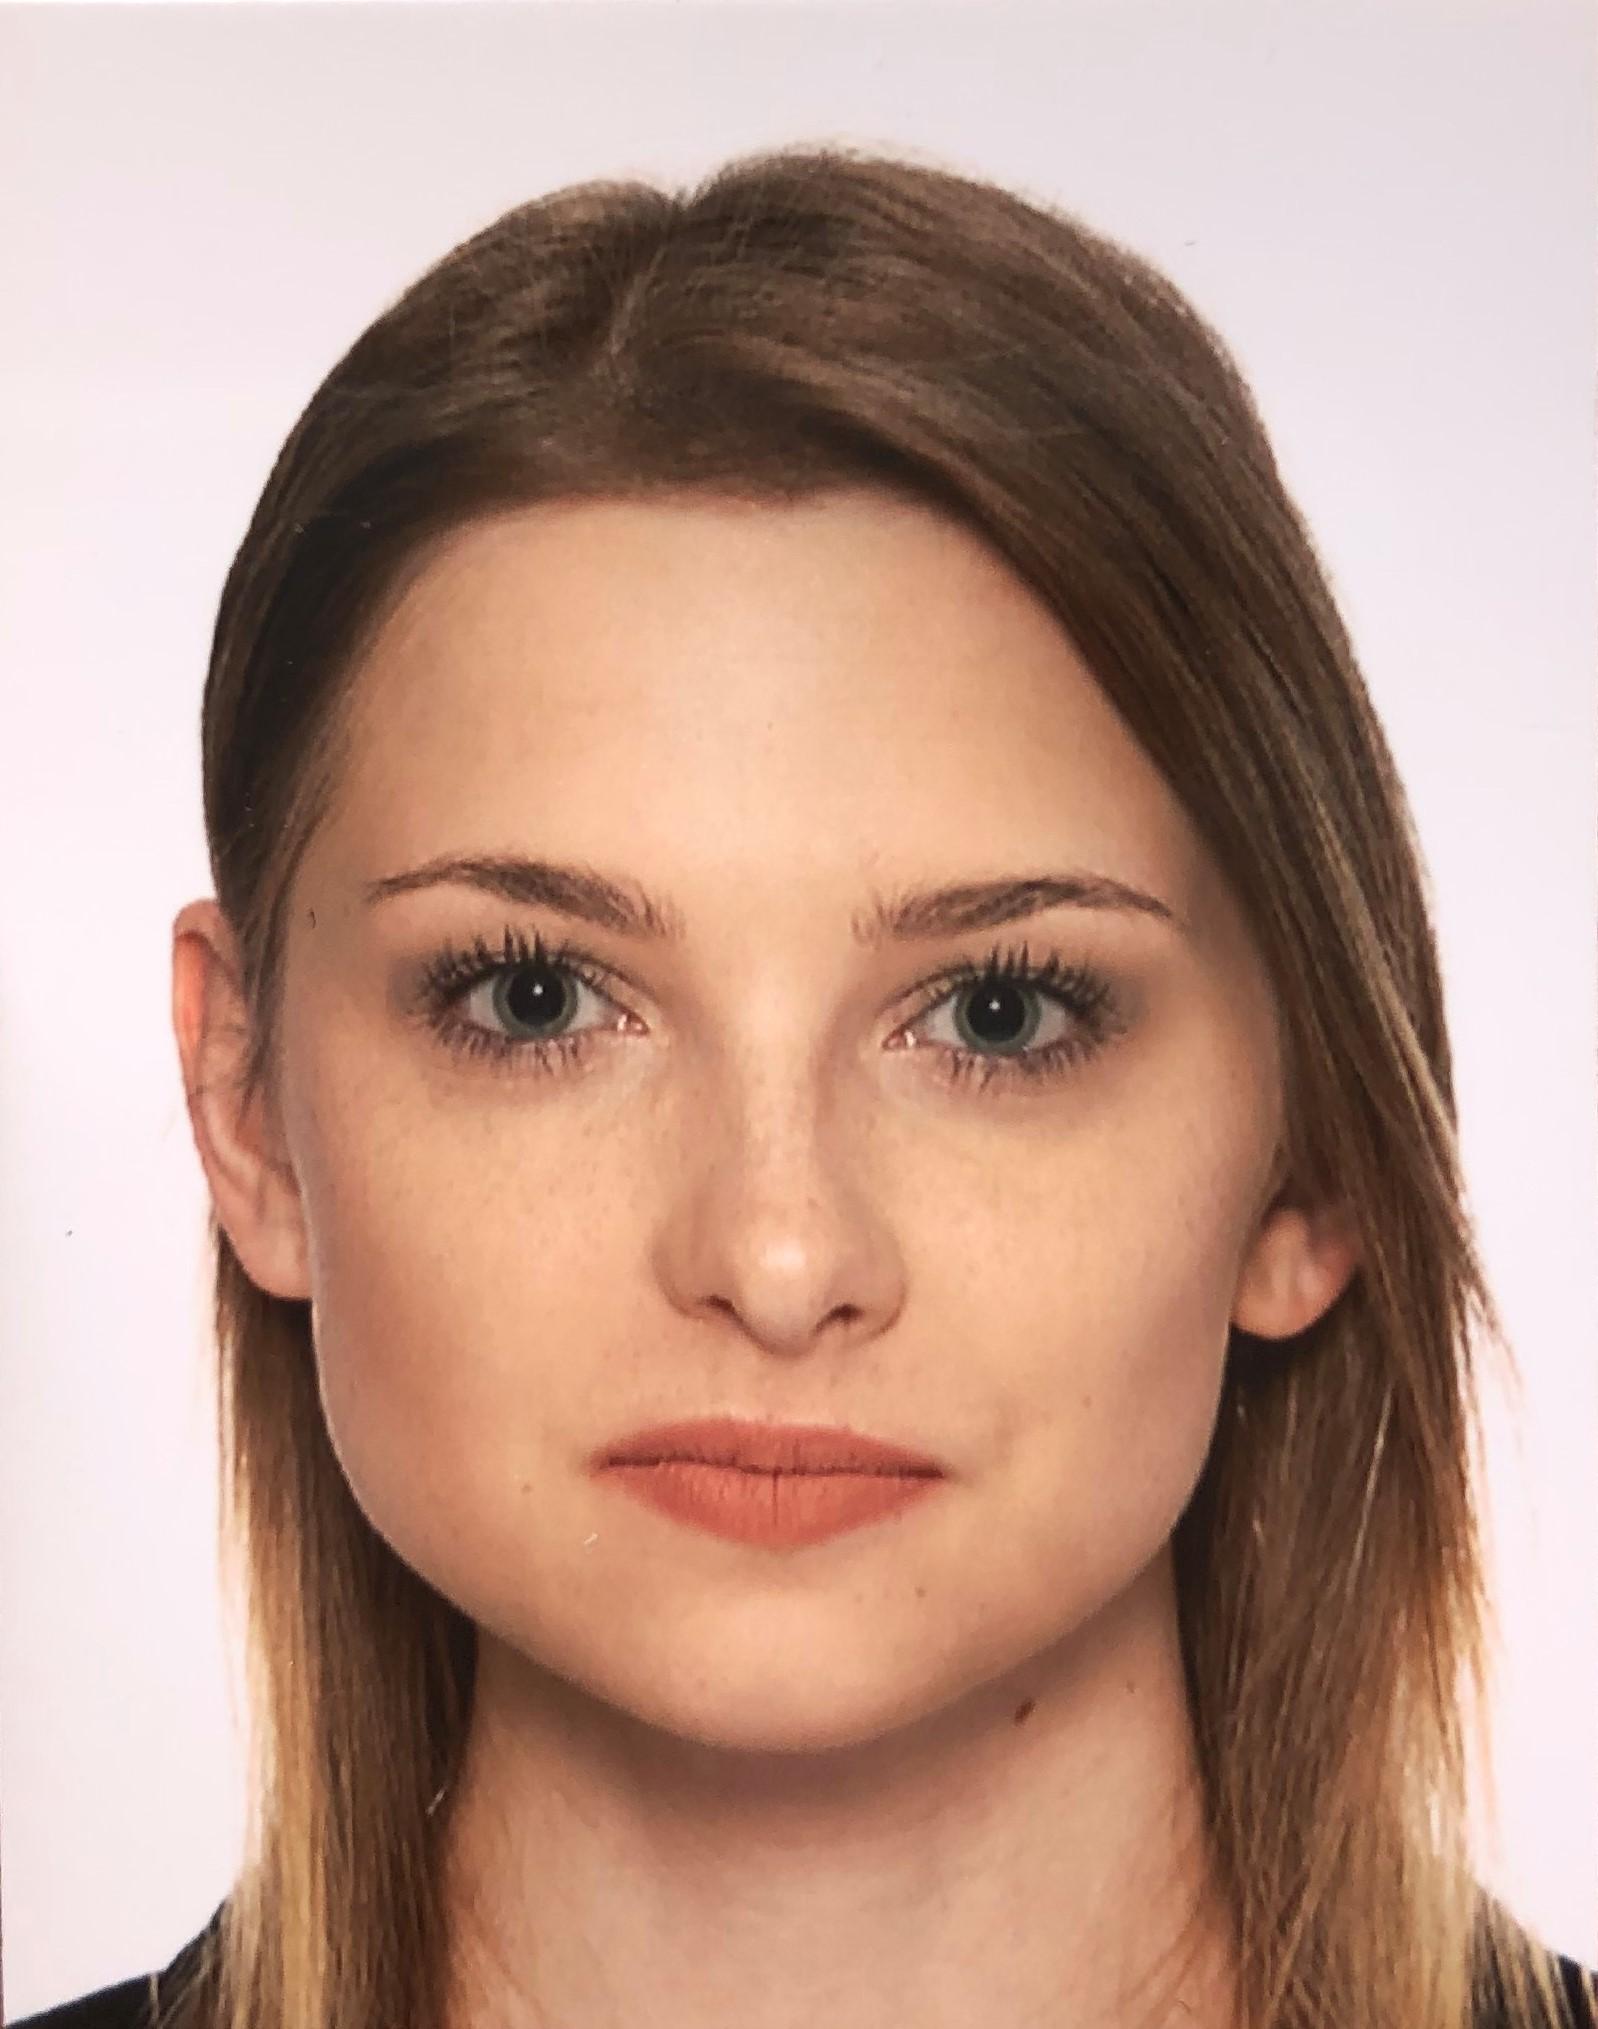 Aleksandra Kalinowska